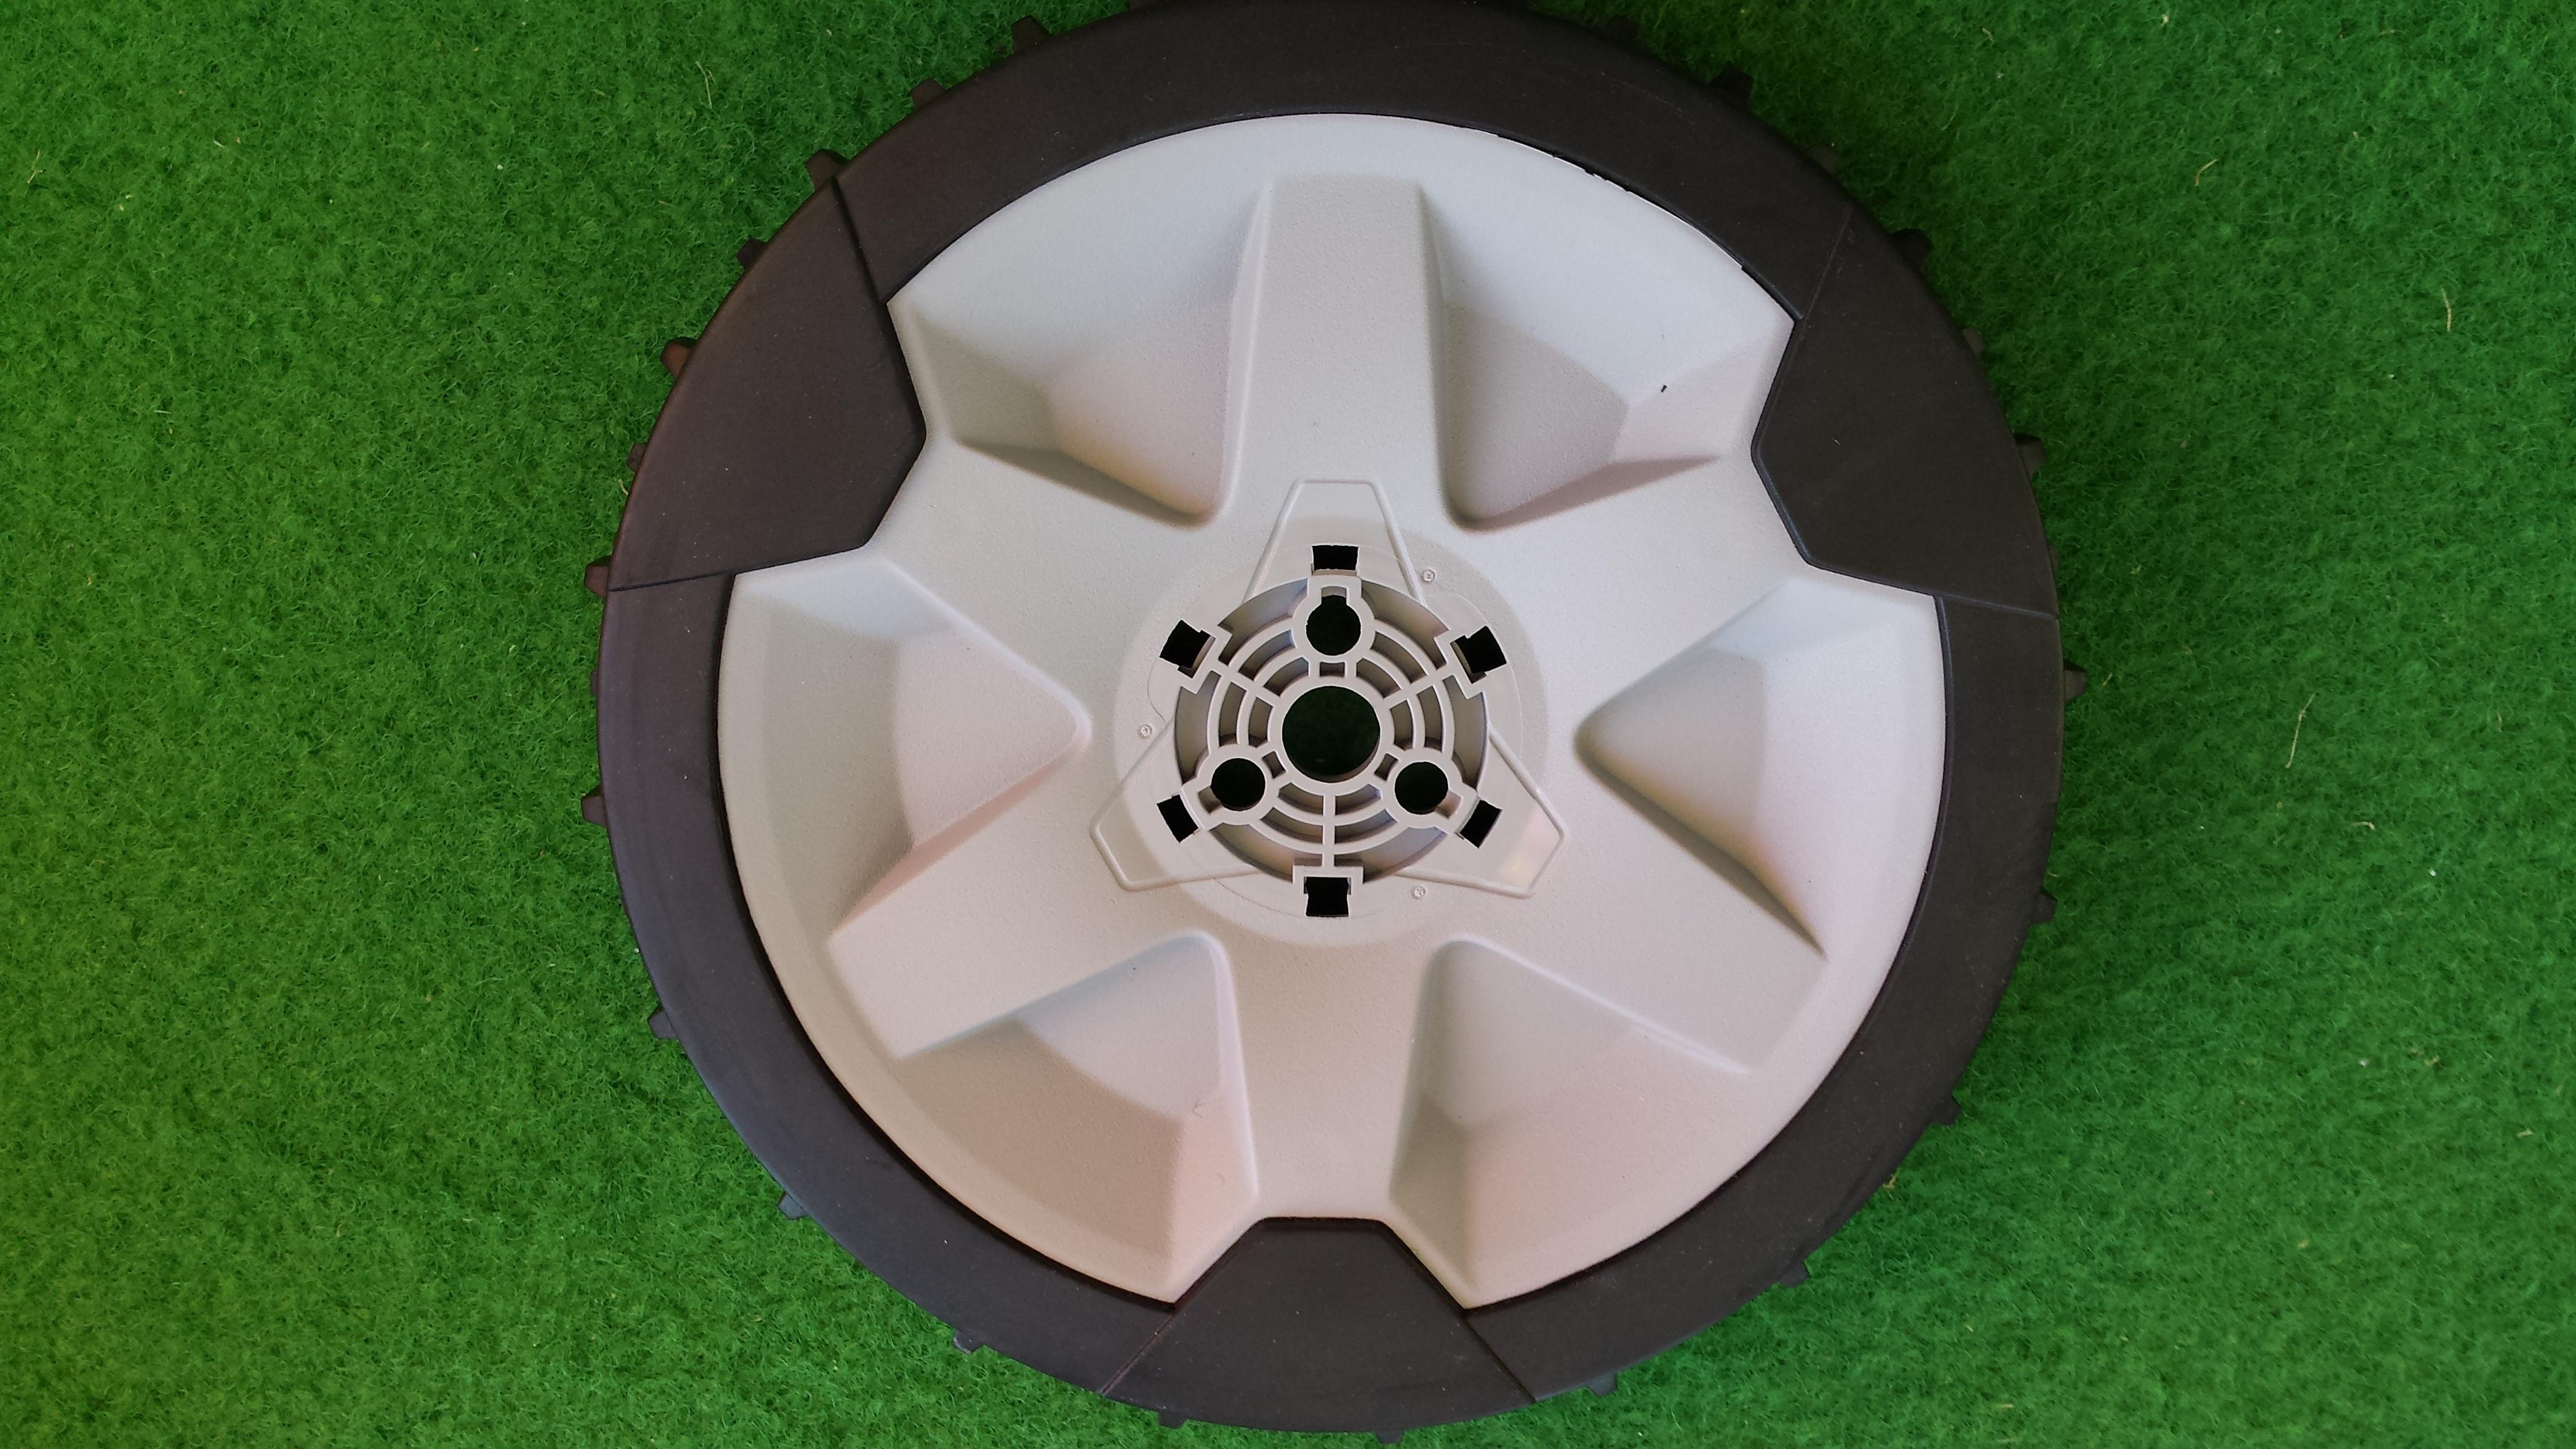 *Original* Husqvarna Radsatz für Automower 310 315 315X Hinterrad